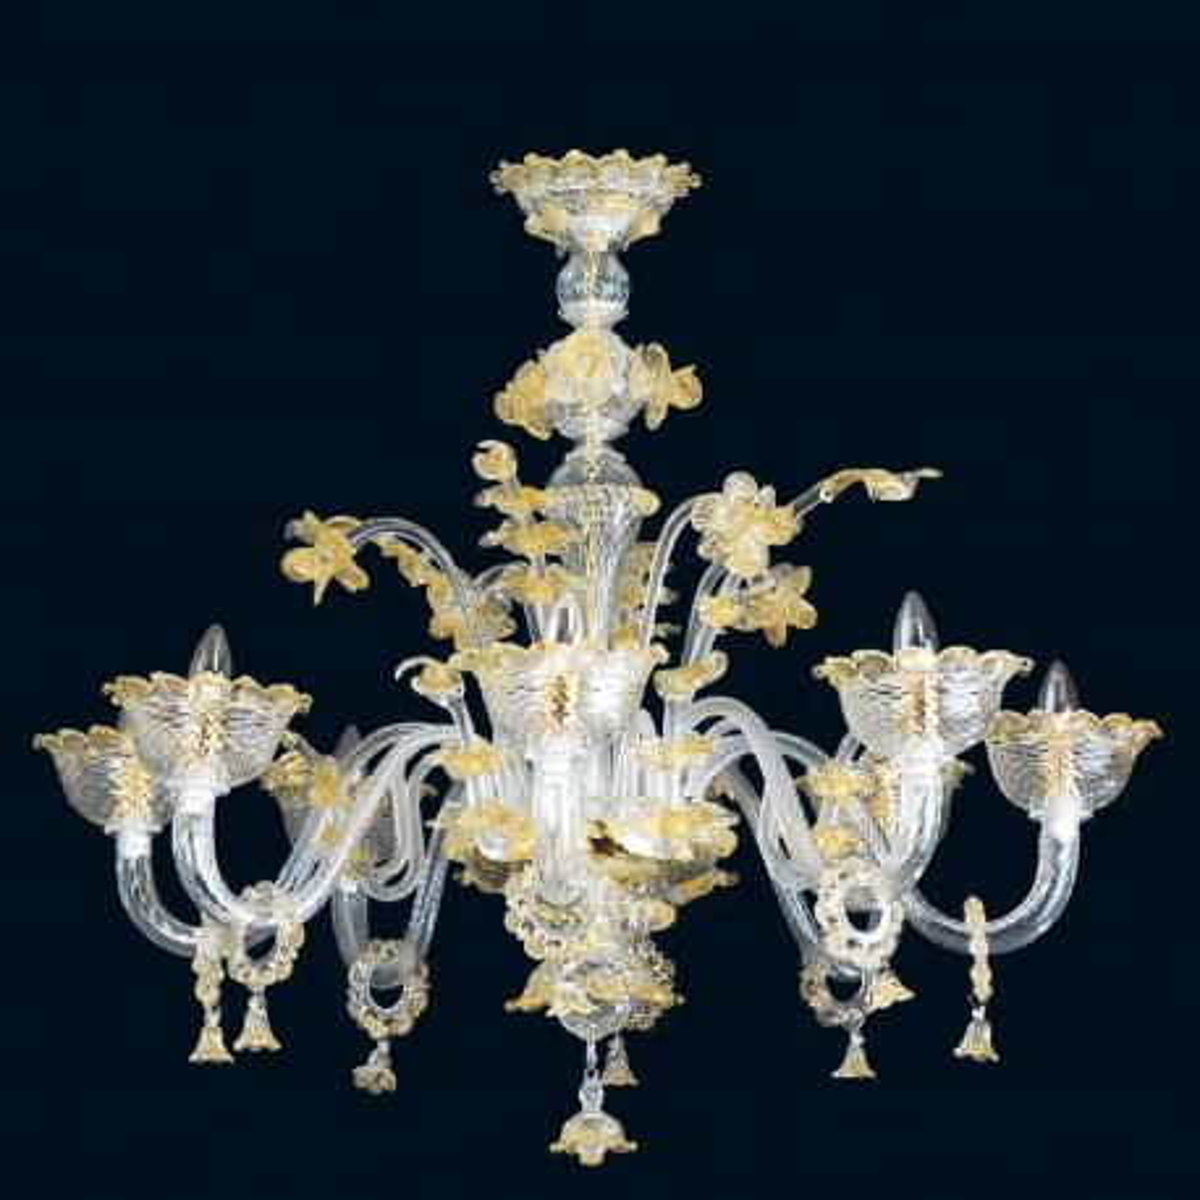 """Divina"" lampara de araña de Murano - 8 luces - transparent y oro"